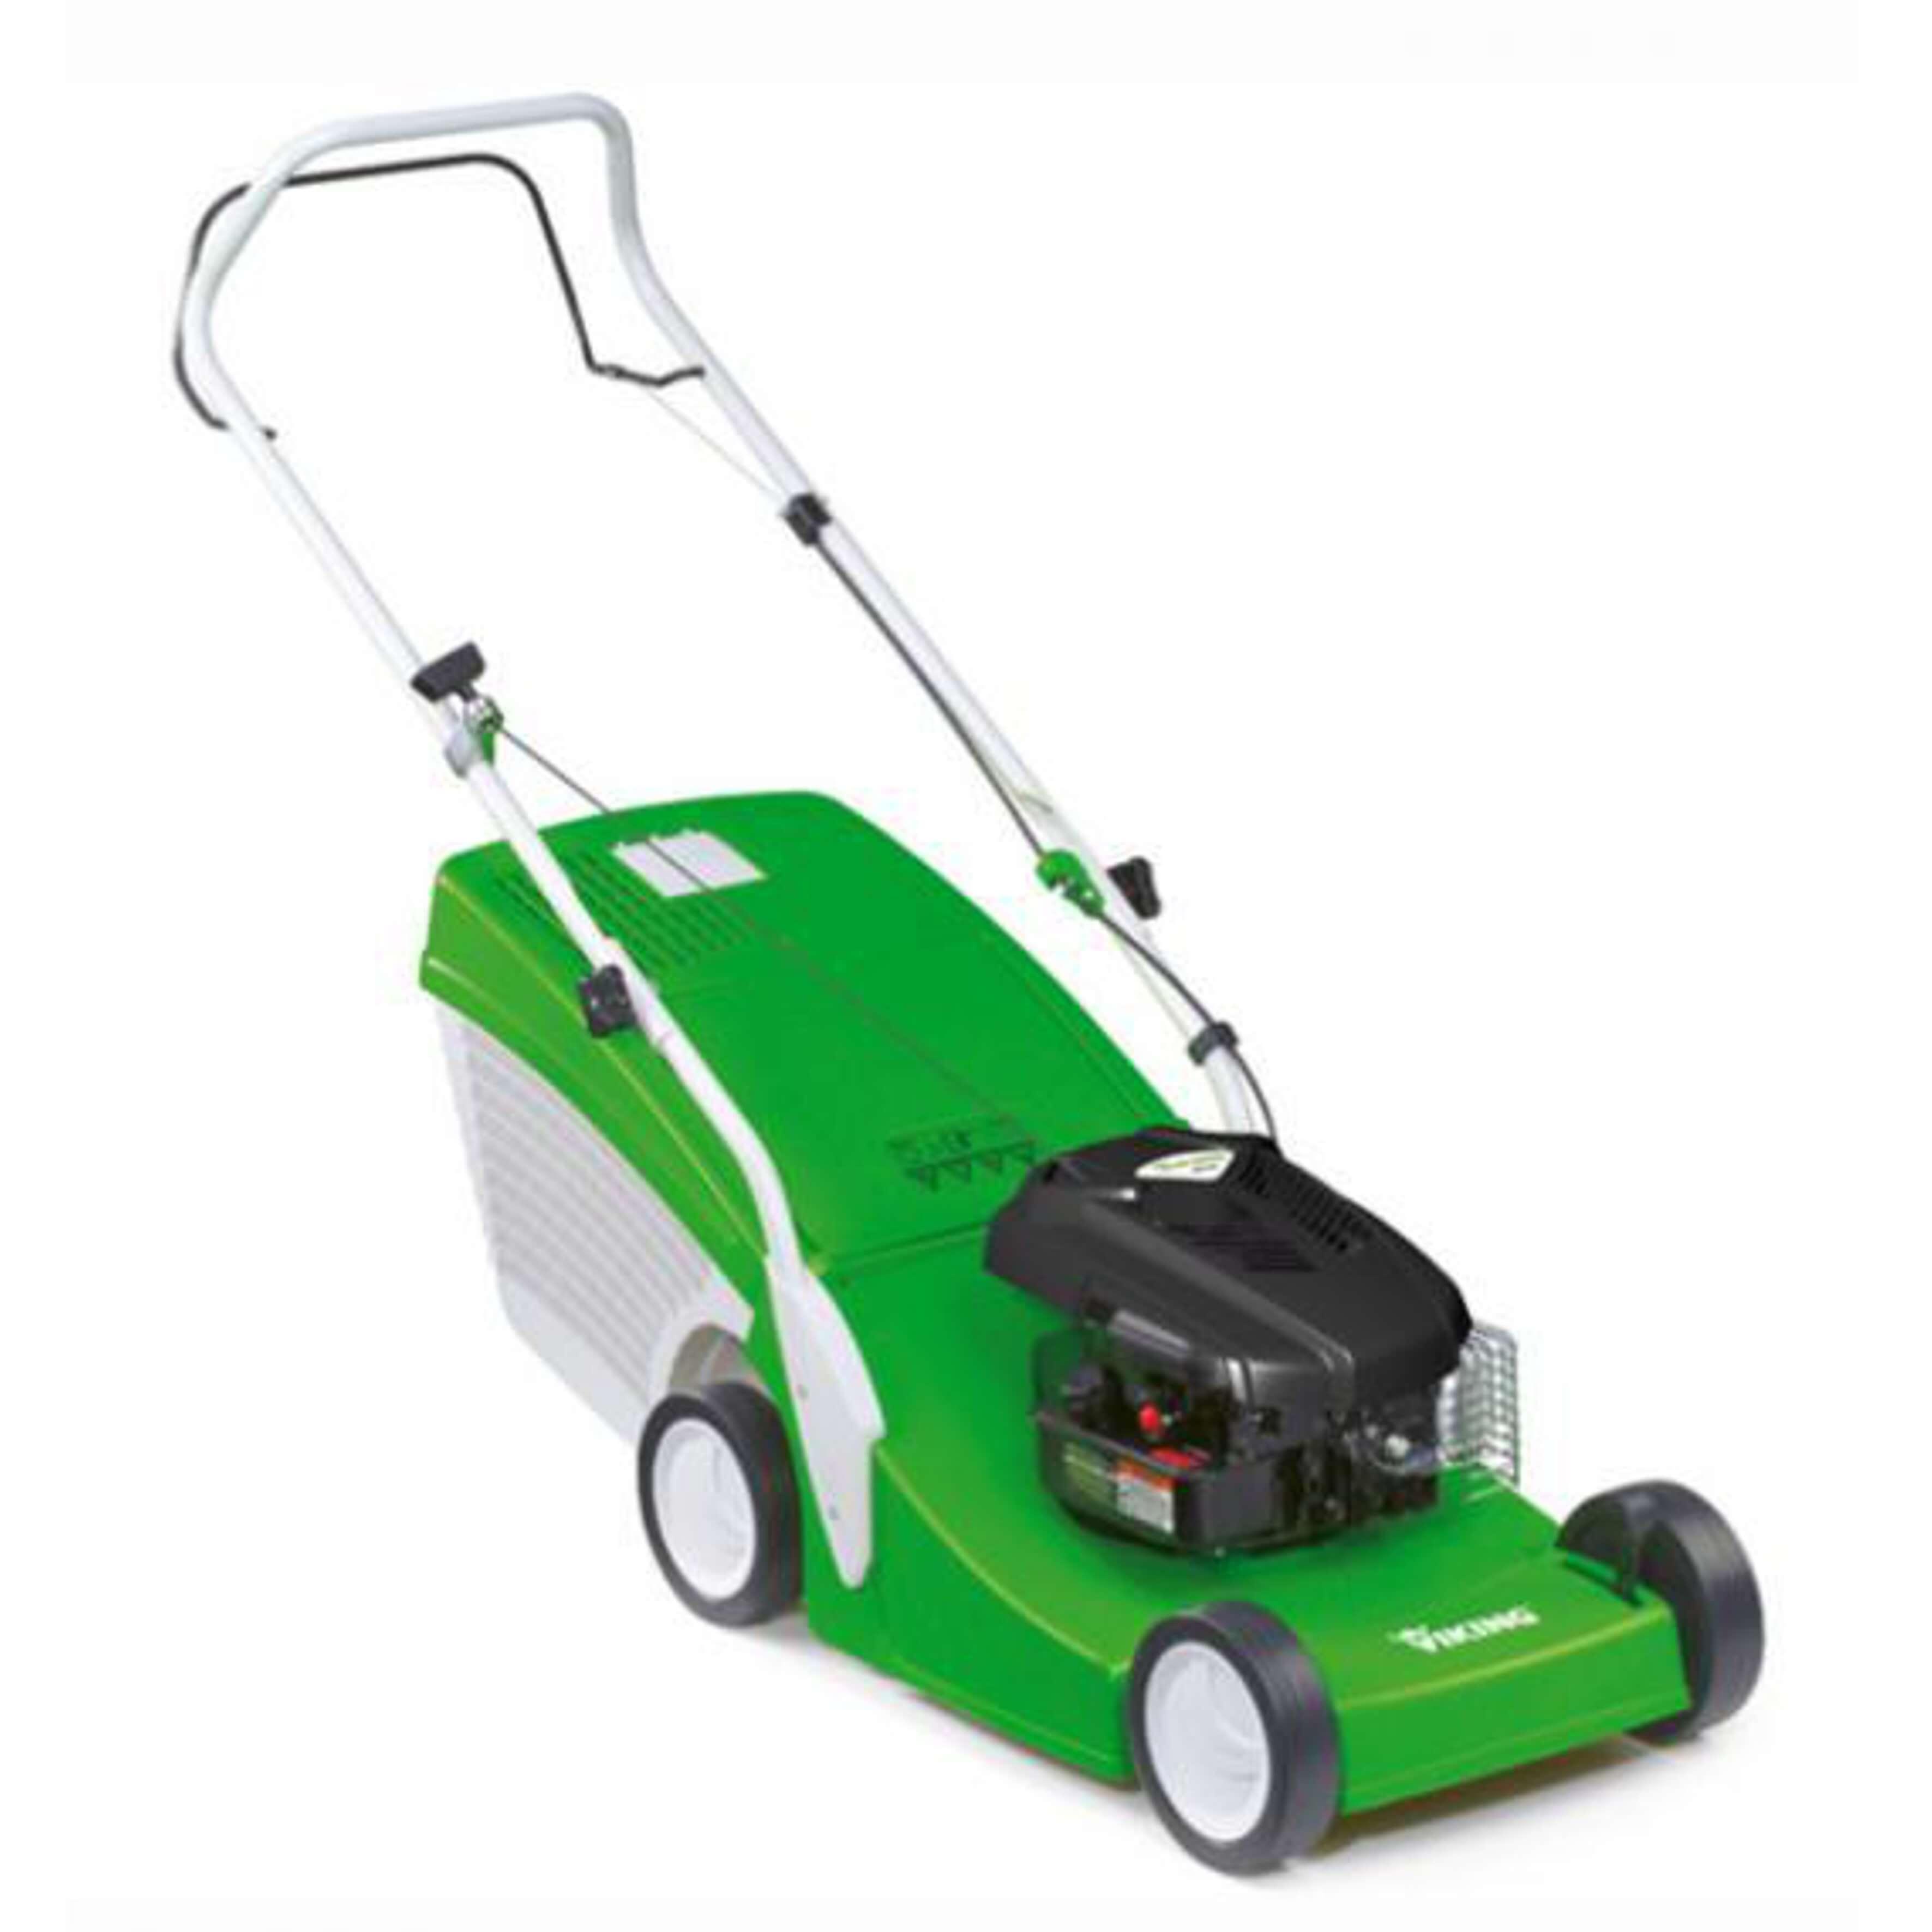 Viking MB 443.1 Petrol Lawn Mowers